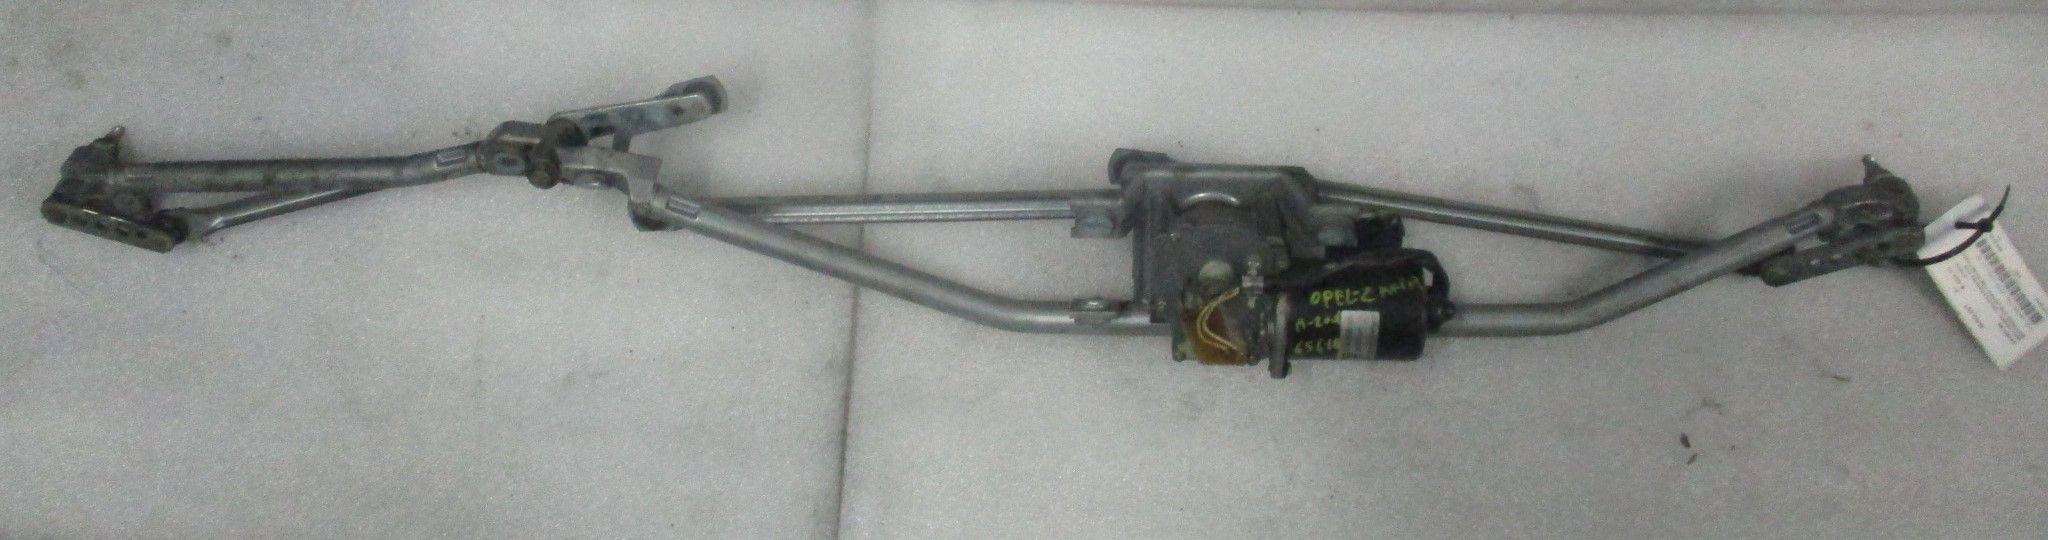 MOTORINO TERGI ANT COMPLETO DI TANDEM OPEL Zafira A Benzina (2001) RICAMBI USATI